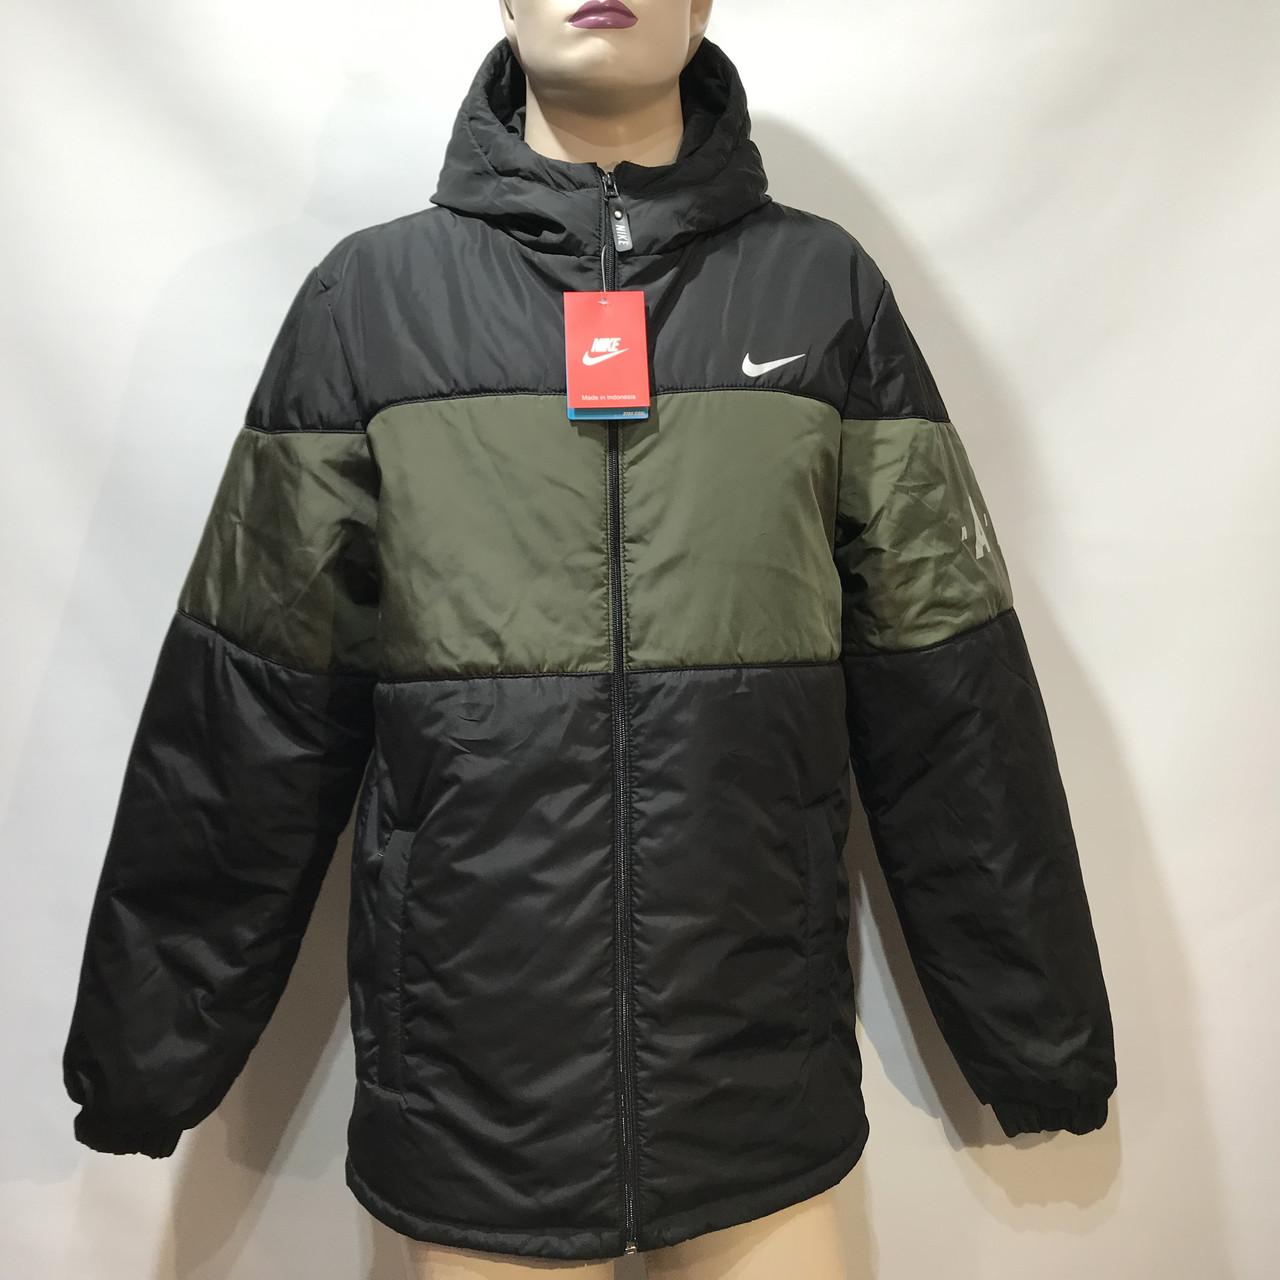 Куртка мужская весна/осень размер XL